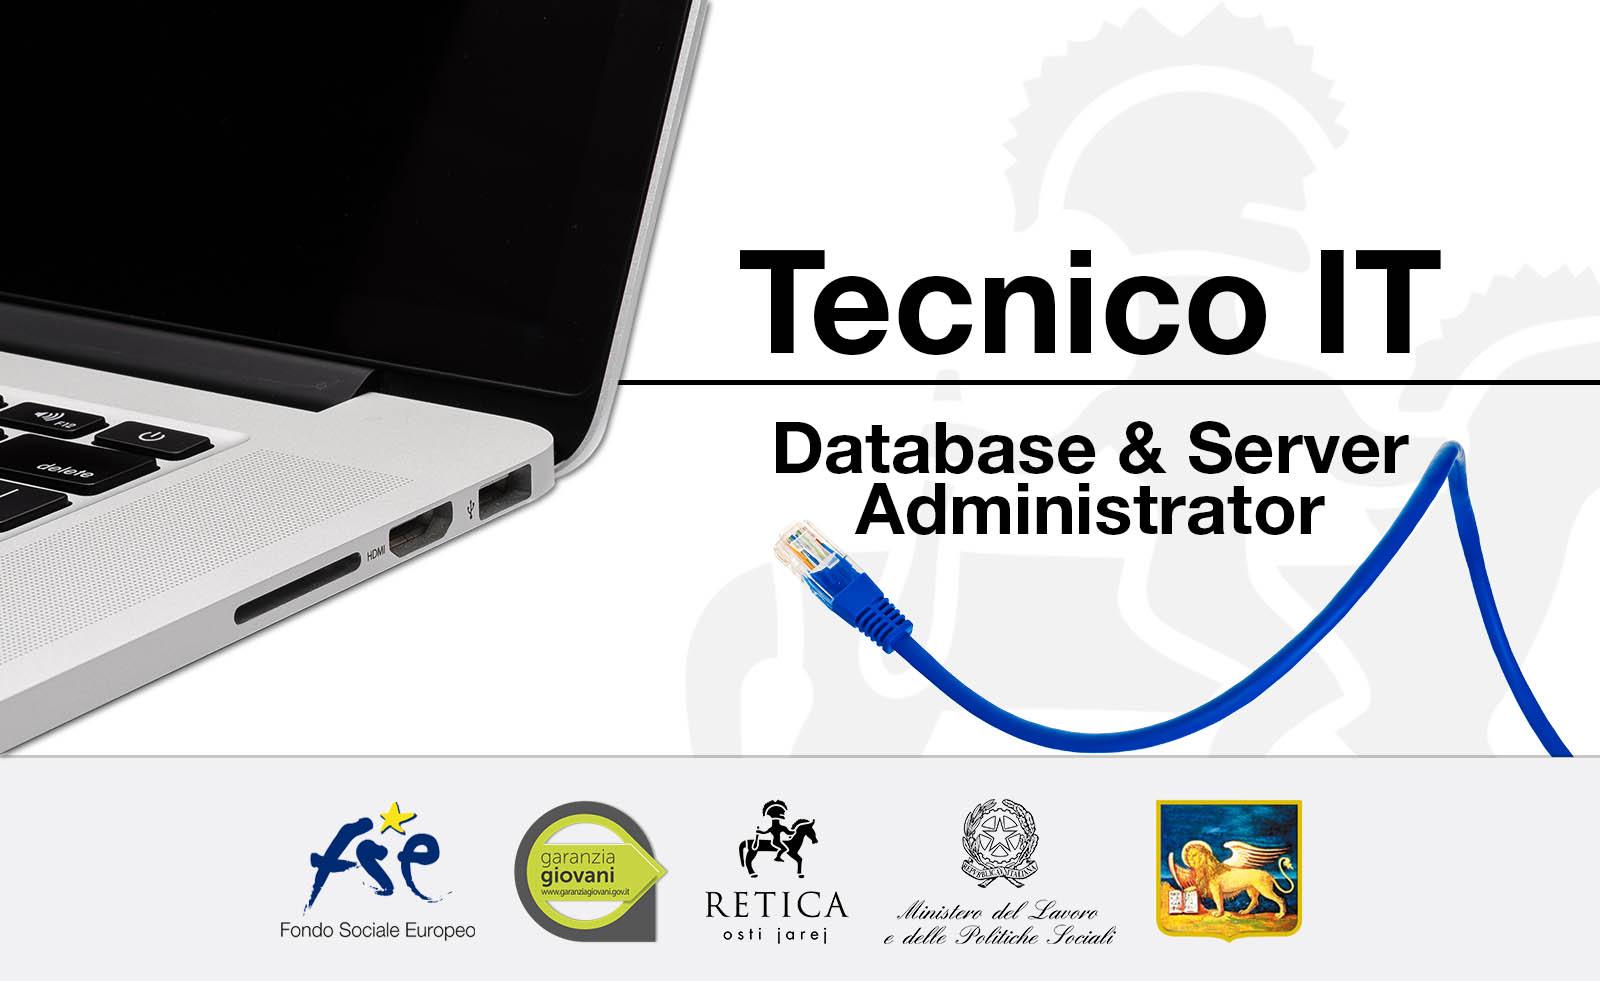 TECNICO INFORMATICO – DATABASE & SERVER ADMINISTRATOR